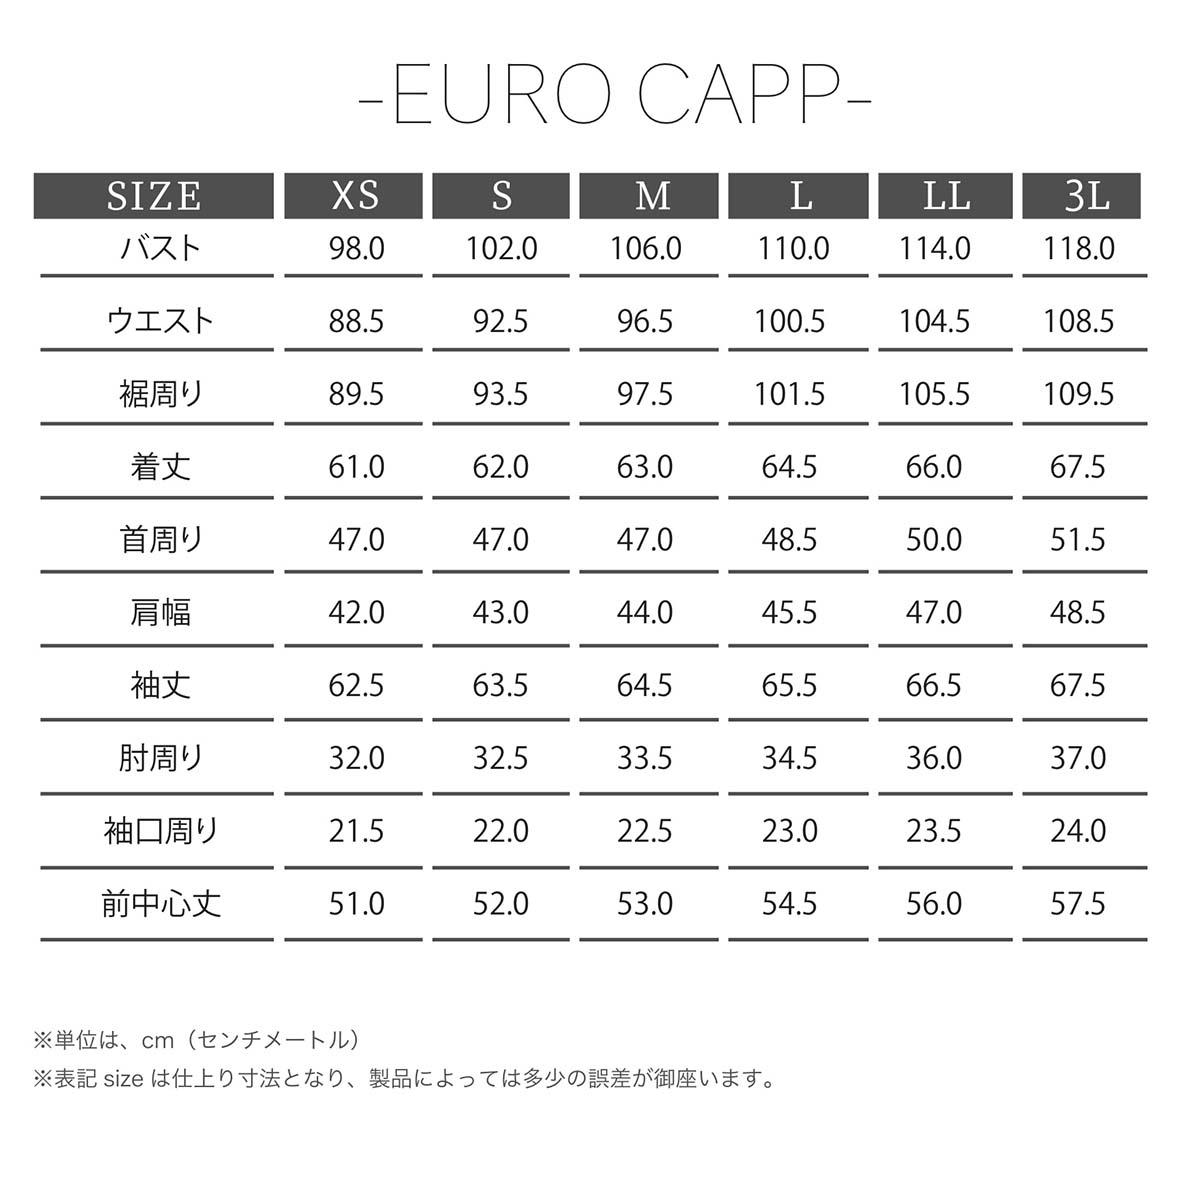 KADOYA(カドヤ) K'S LEATHER  EURO CAPP ユーロカップ フード着脱式 ワイン